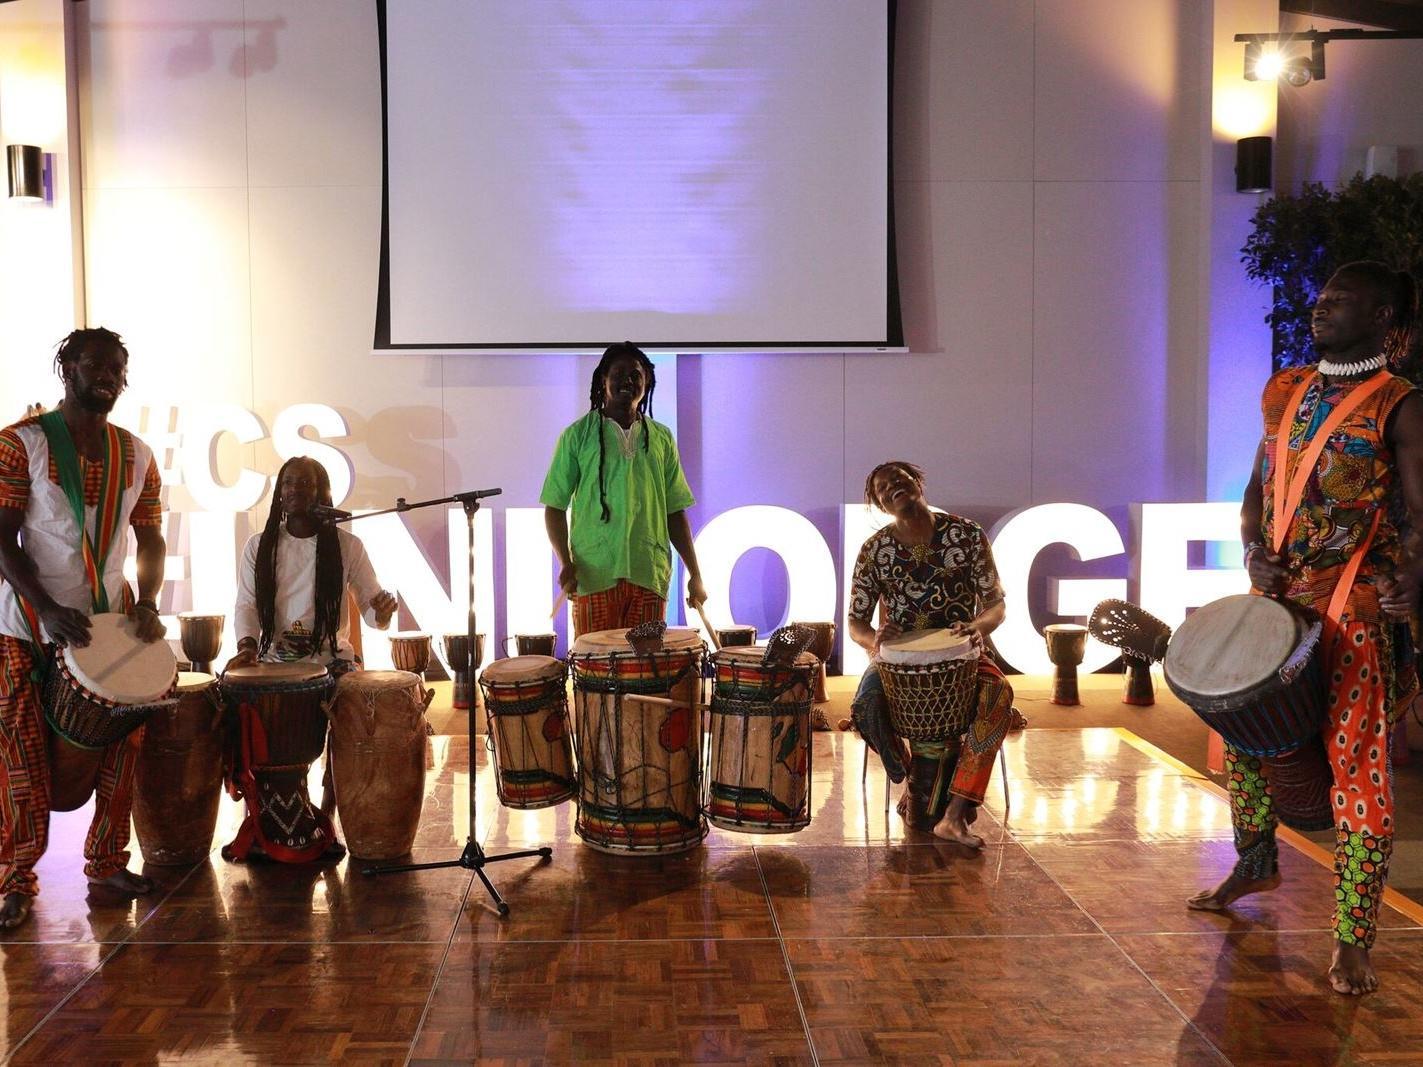 UniLodge Events - Community Spirit Program